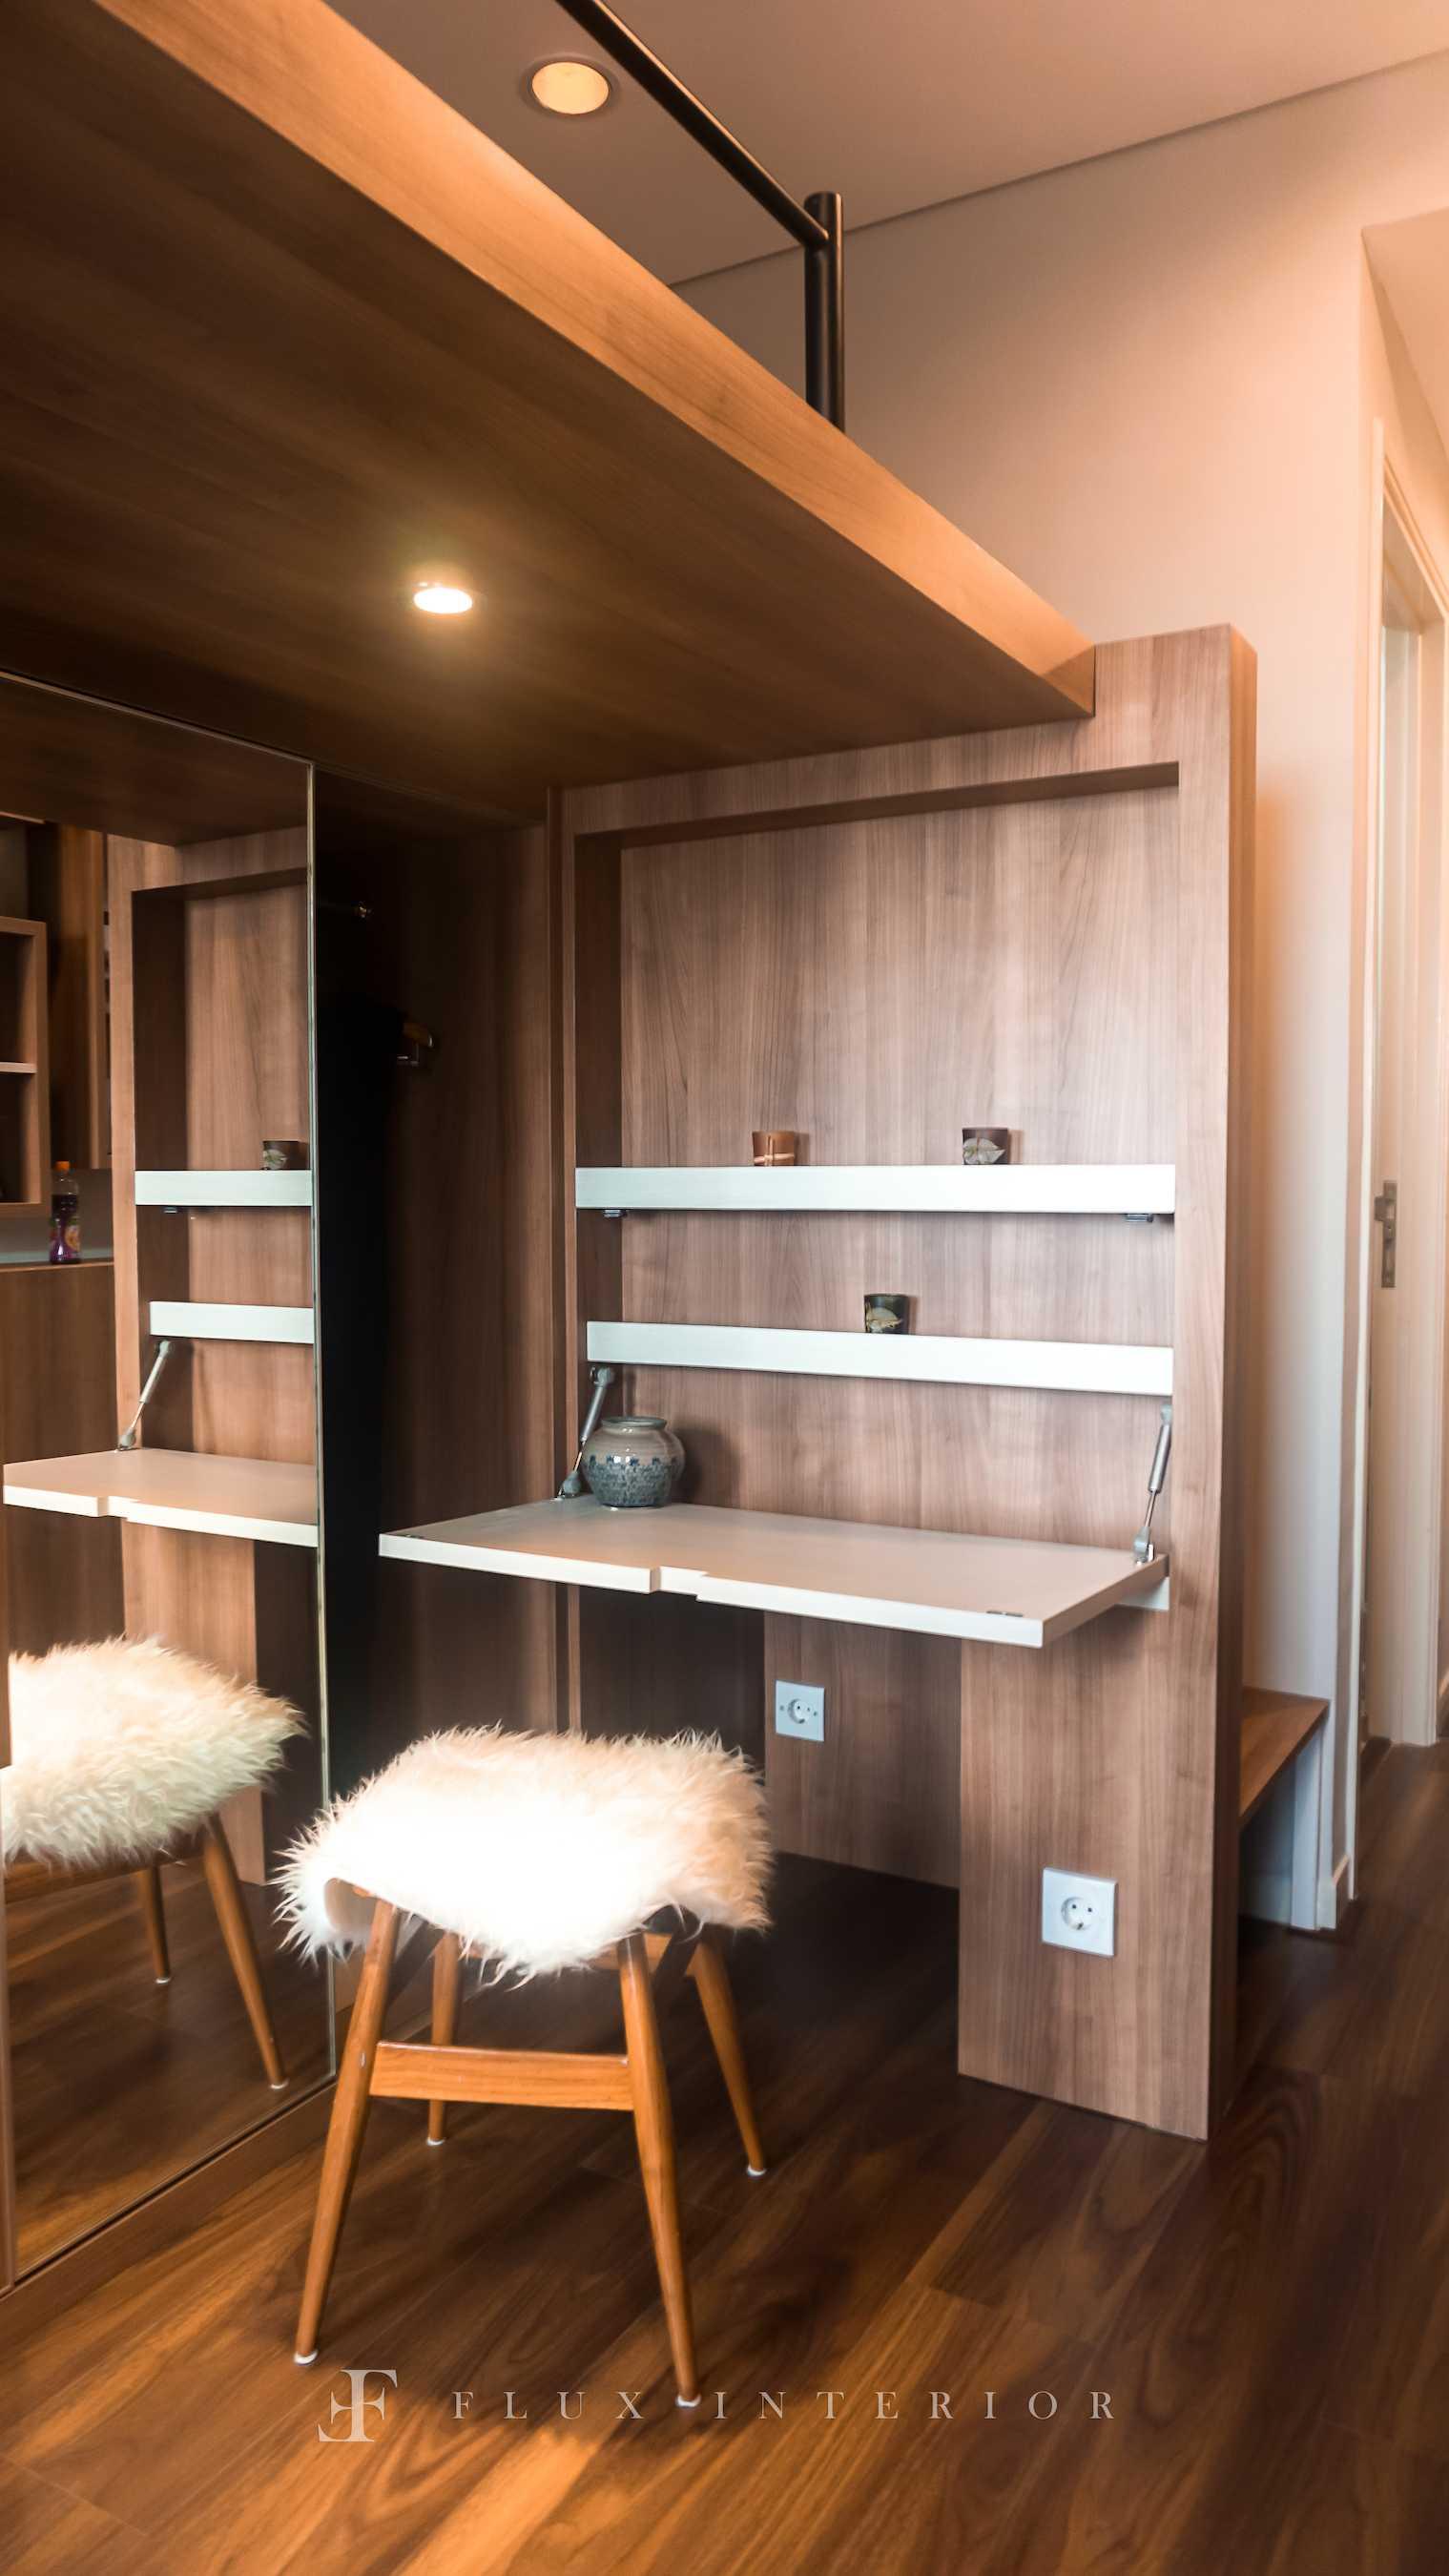 Flux Interior Loft-Style Studio Apartment At Madison Park Residences, West Jakarta Jakarta Barat, Kb. Jeruk, Kota Jakarta Barat, Daerah Khusus Ibukota Jakarta, Indonesia  View Make-Up Table And Drawer Minimalis  51843